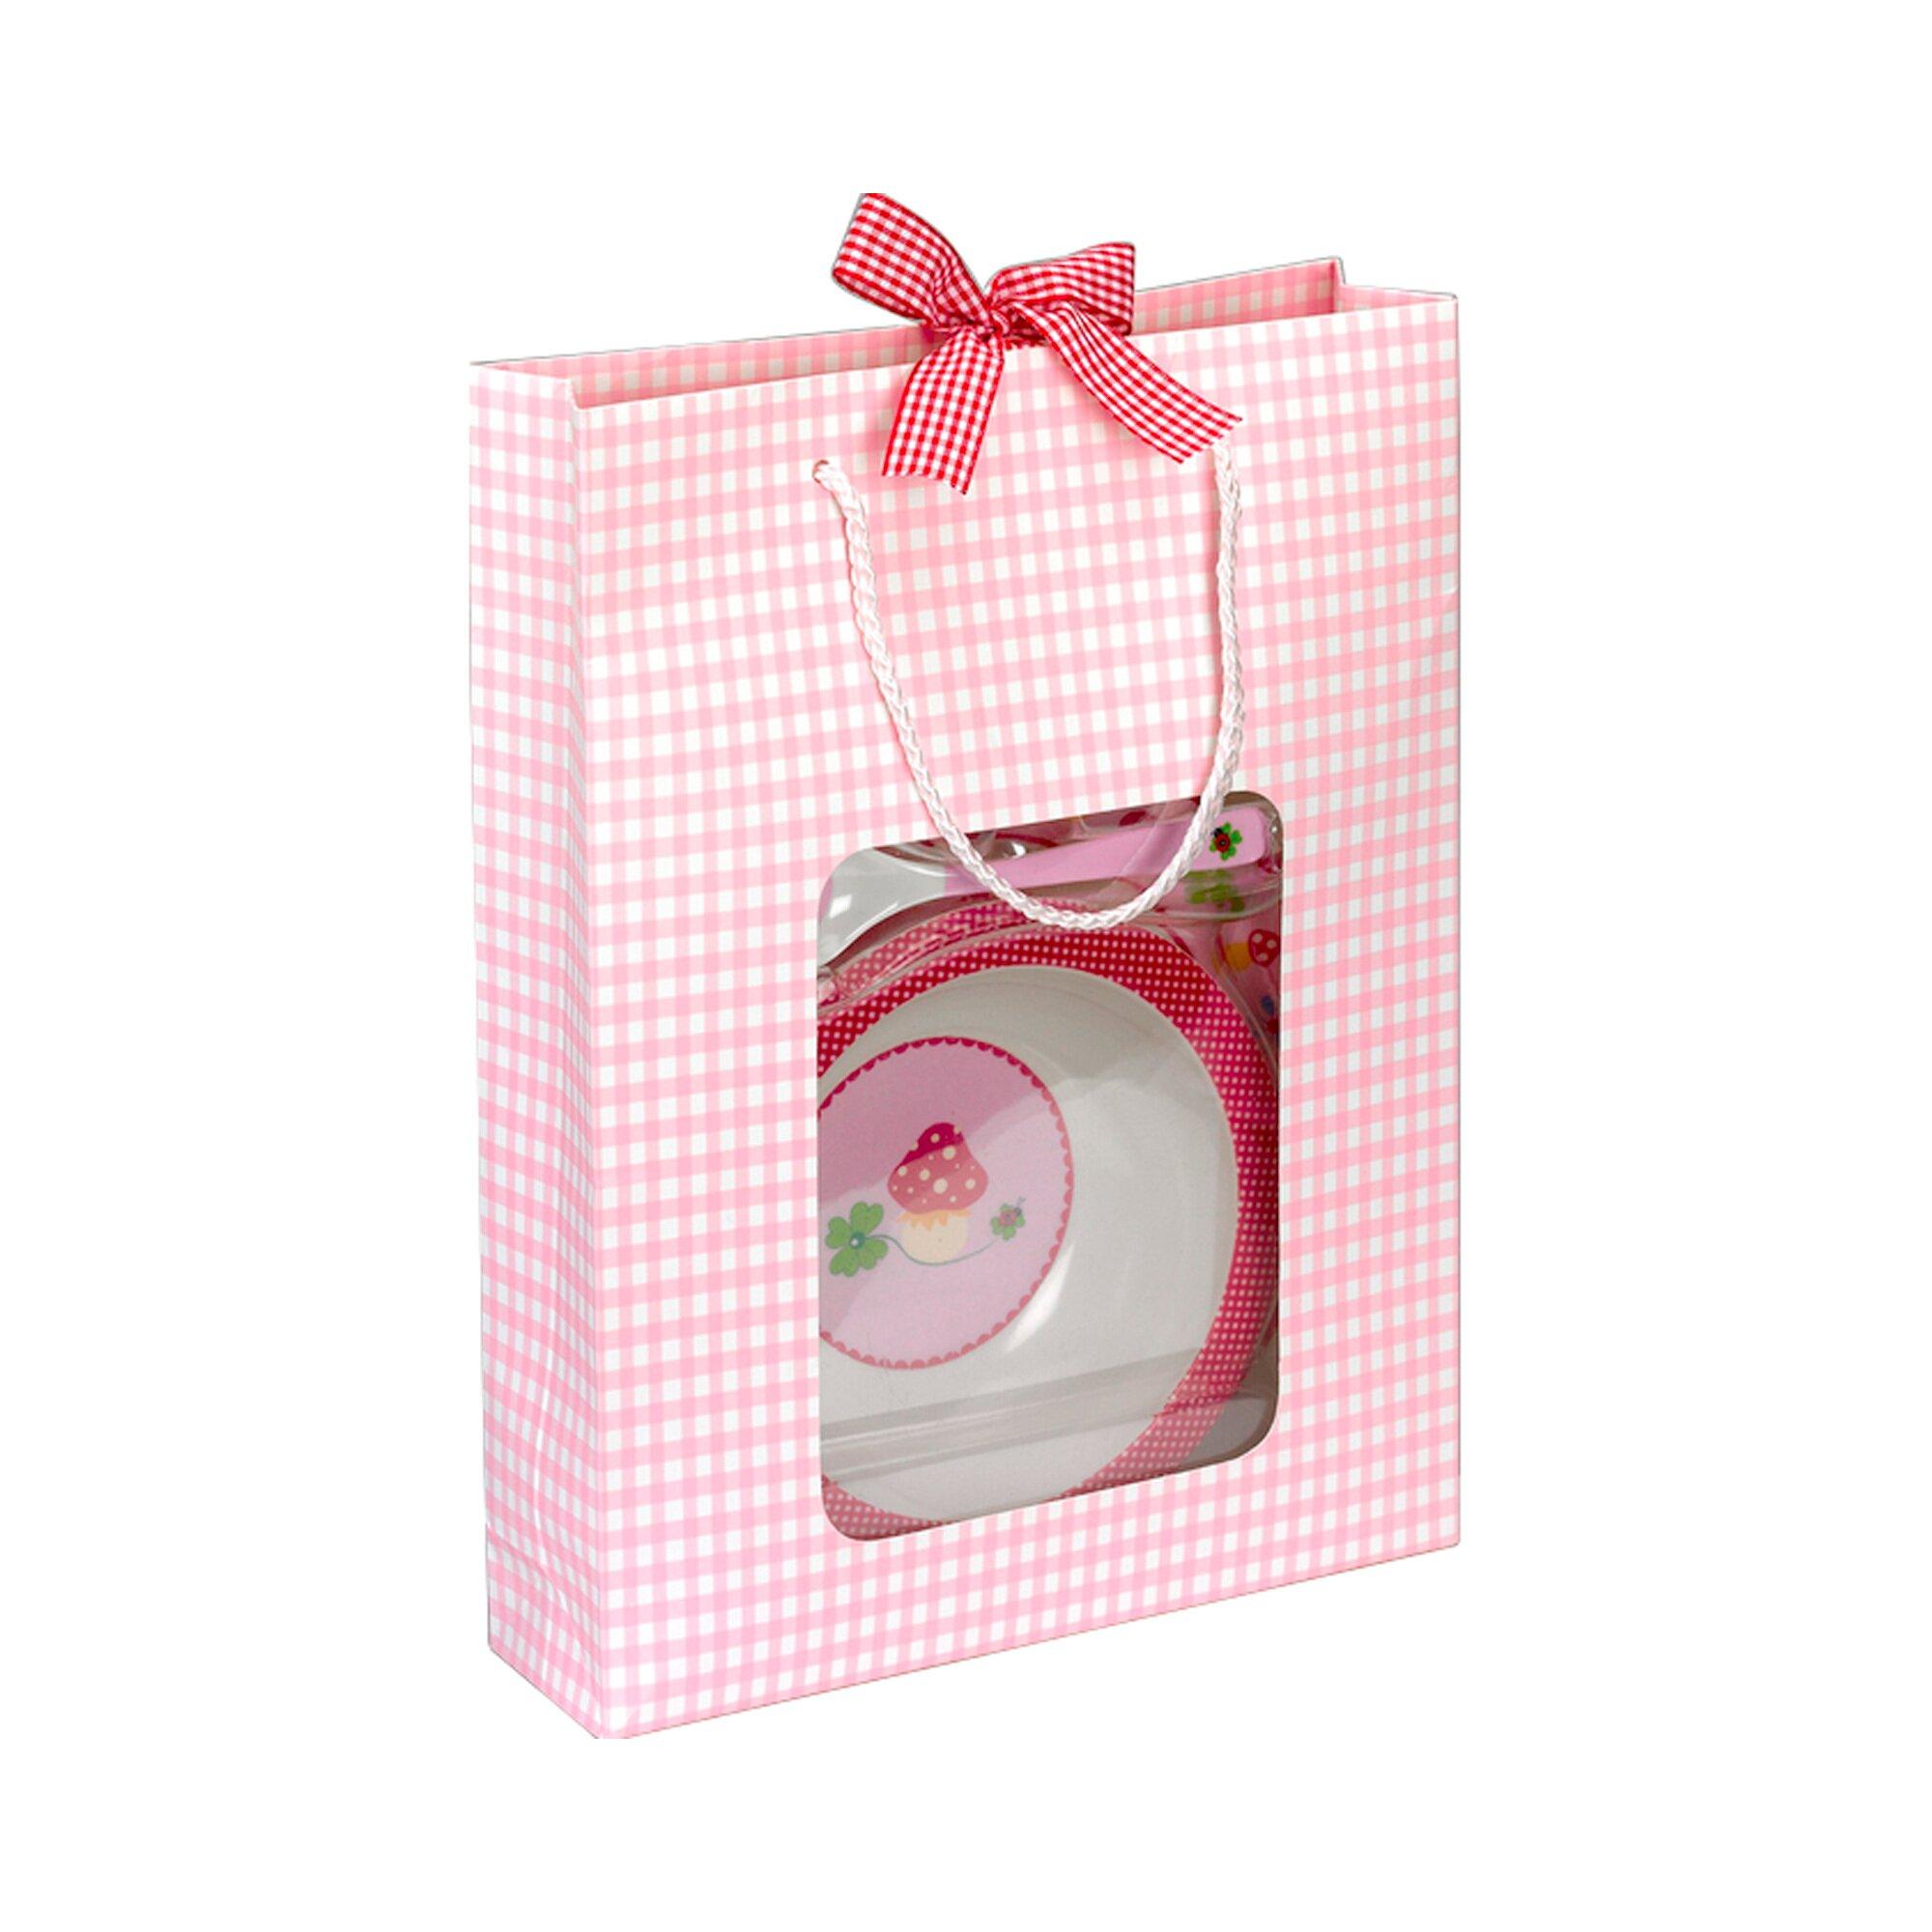 coppenrath-geschirrset-baby-gluck-rosa